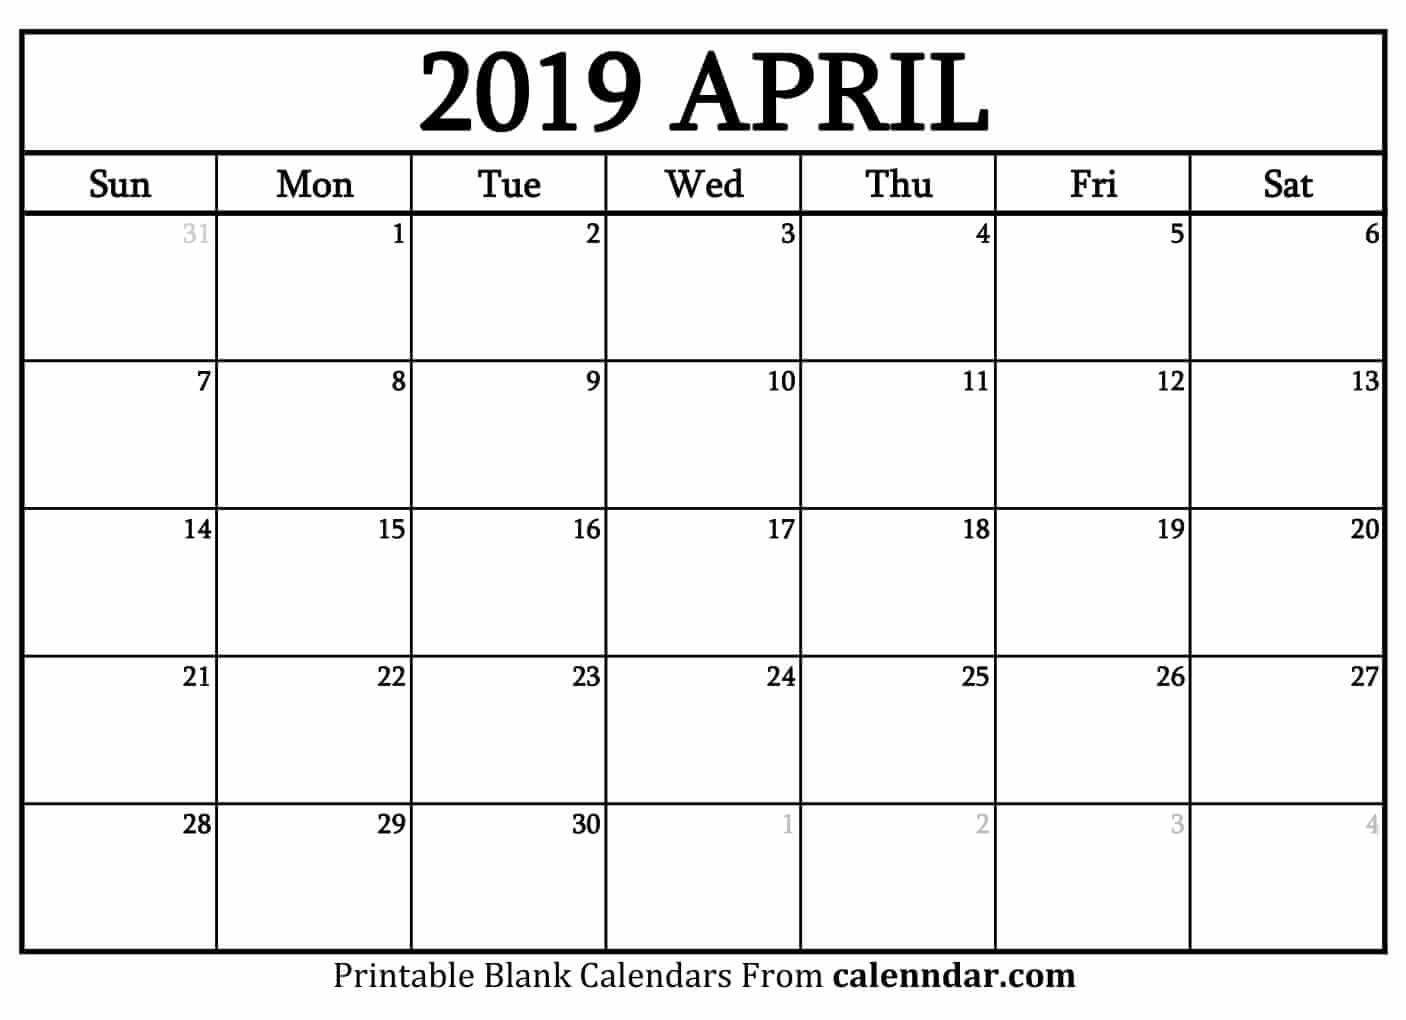 Blank April 2019 Printable Calendar – Printable Calendar 2019| Blank A Calendar For April 2019